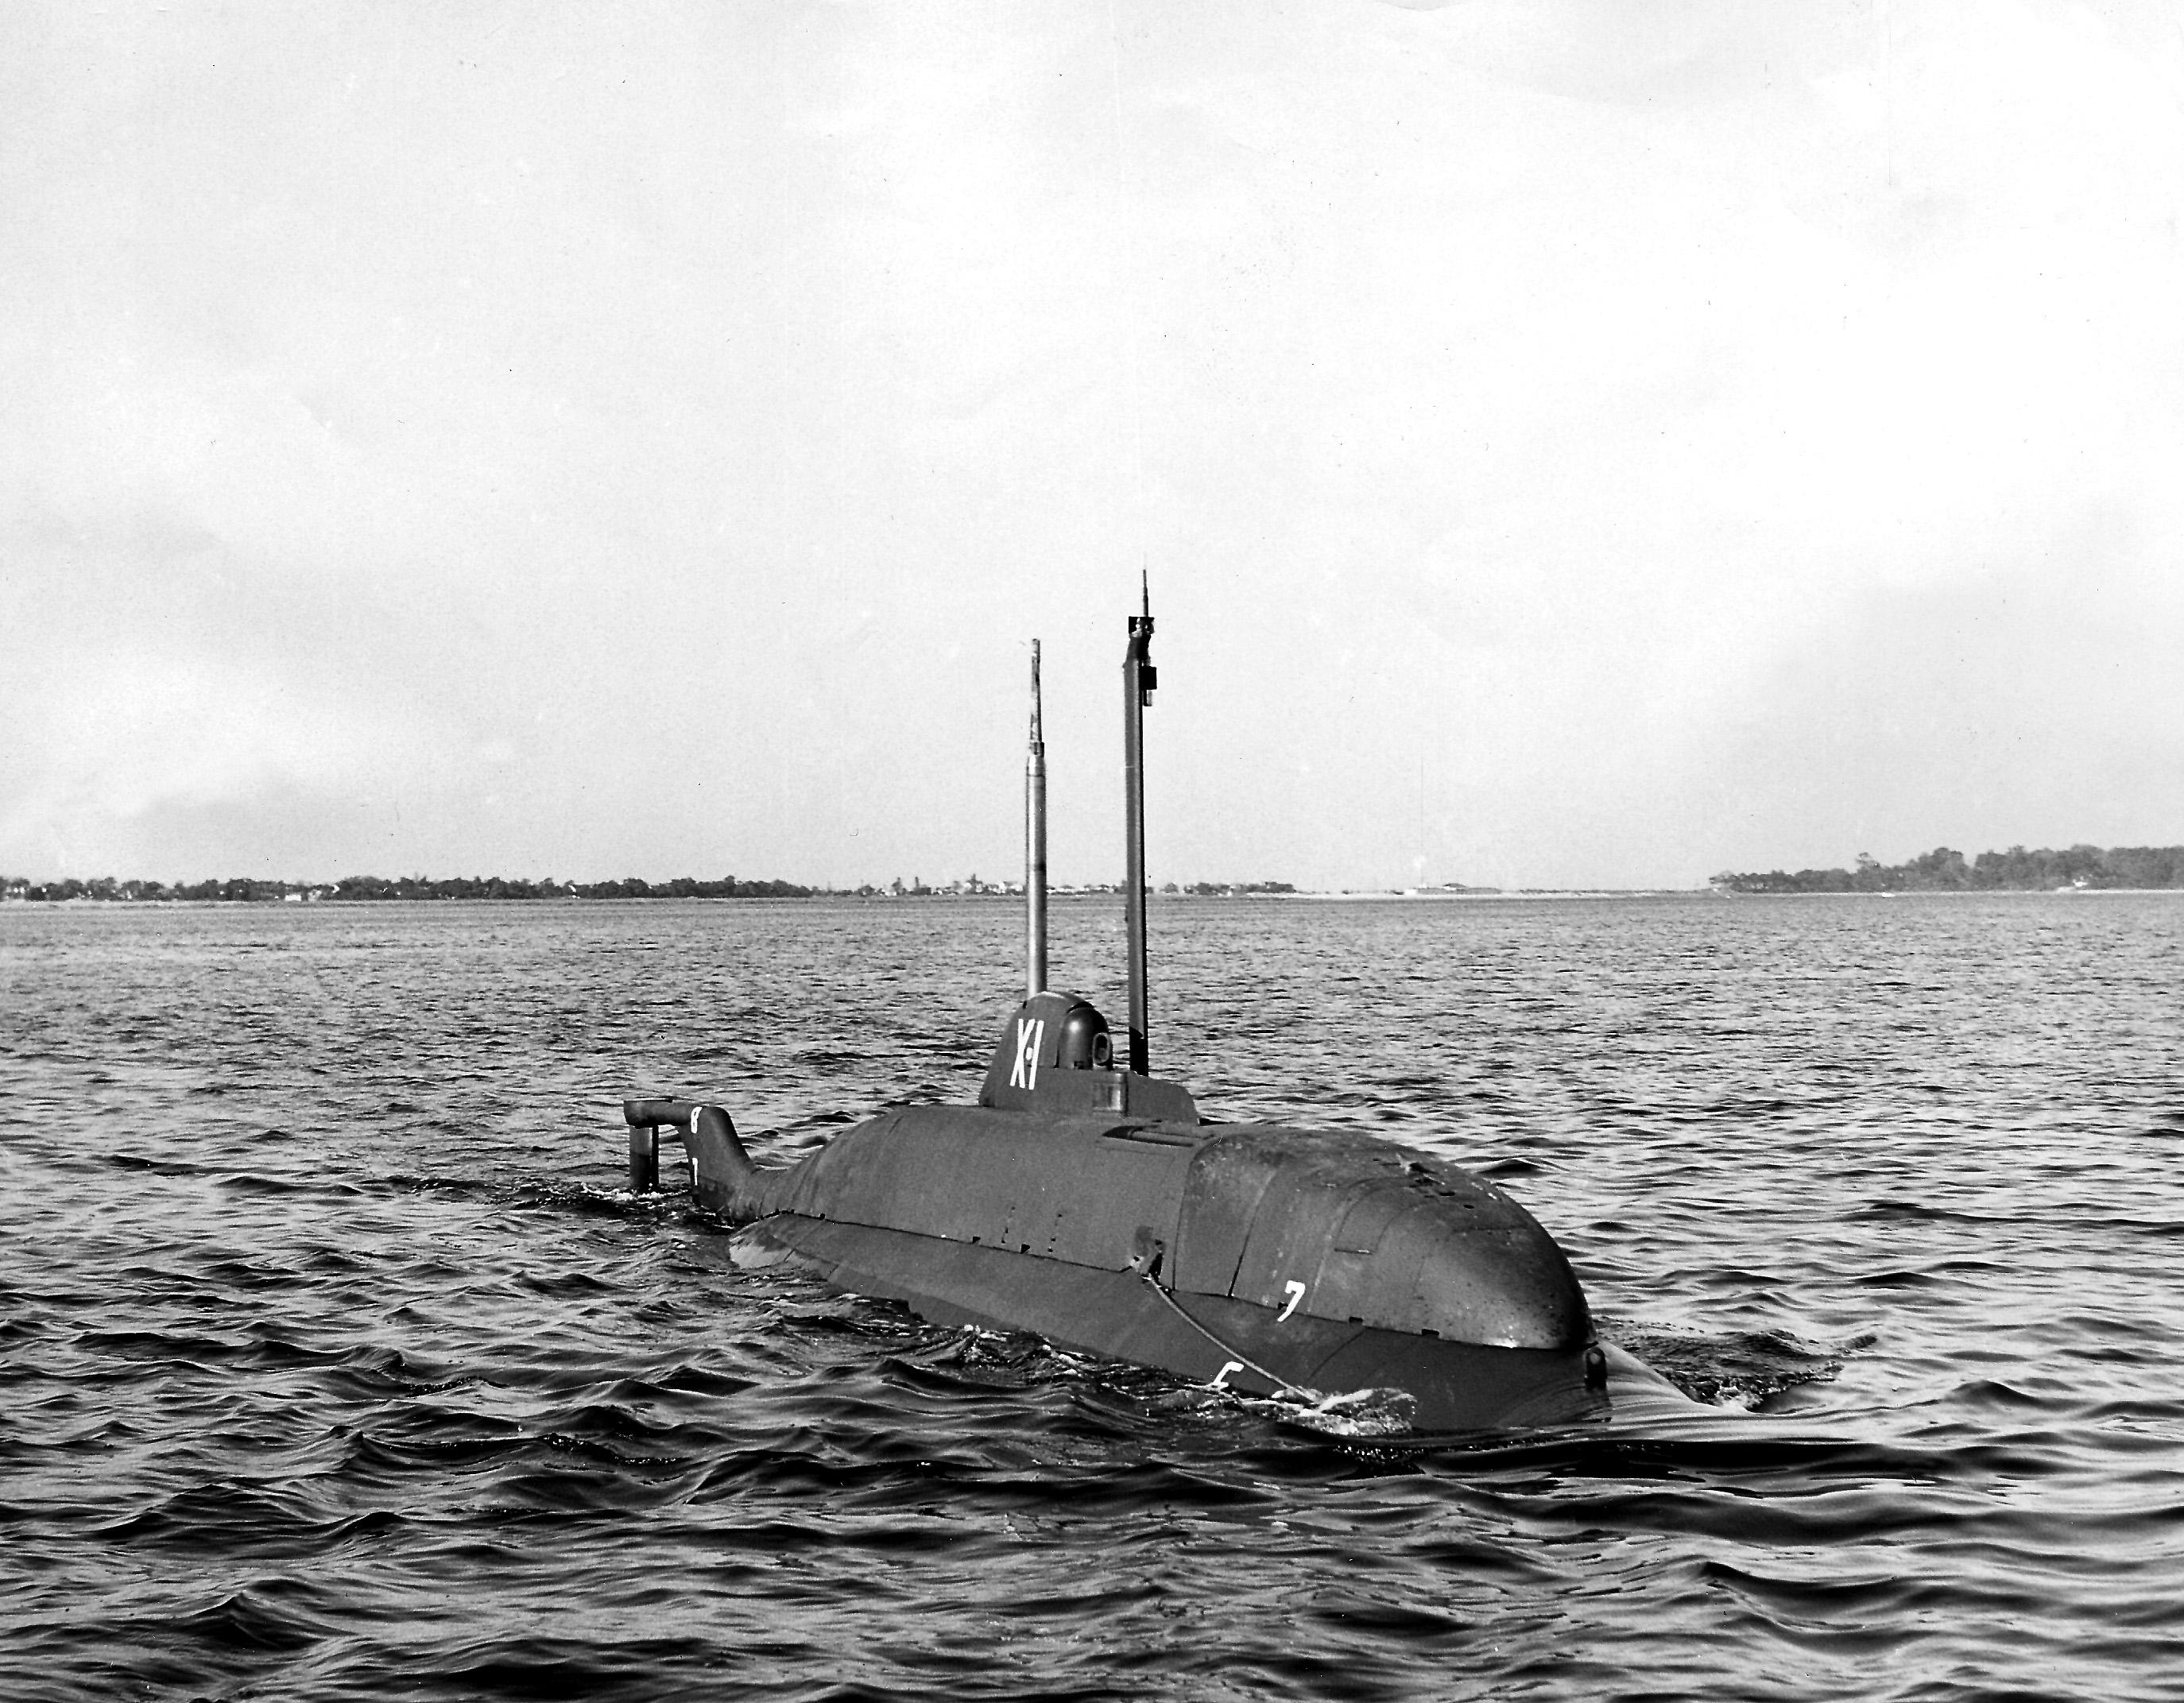 The midget submarine